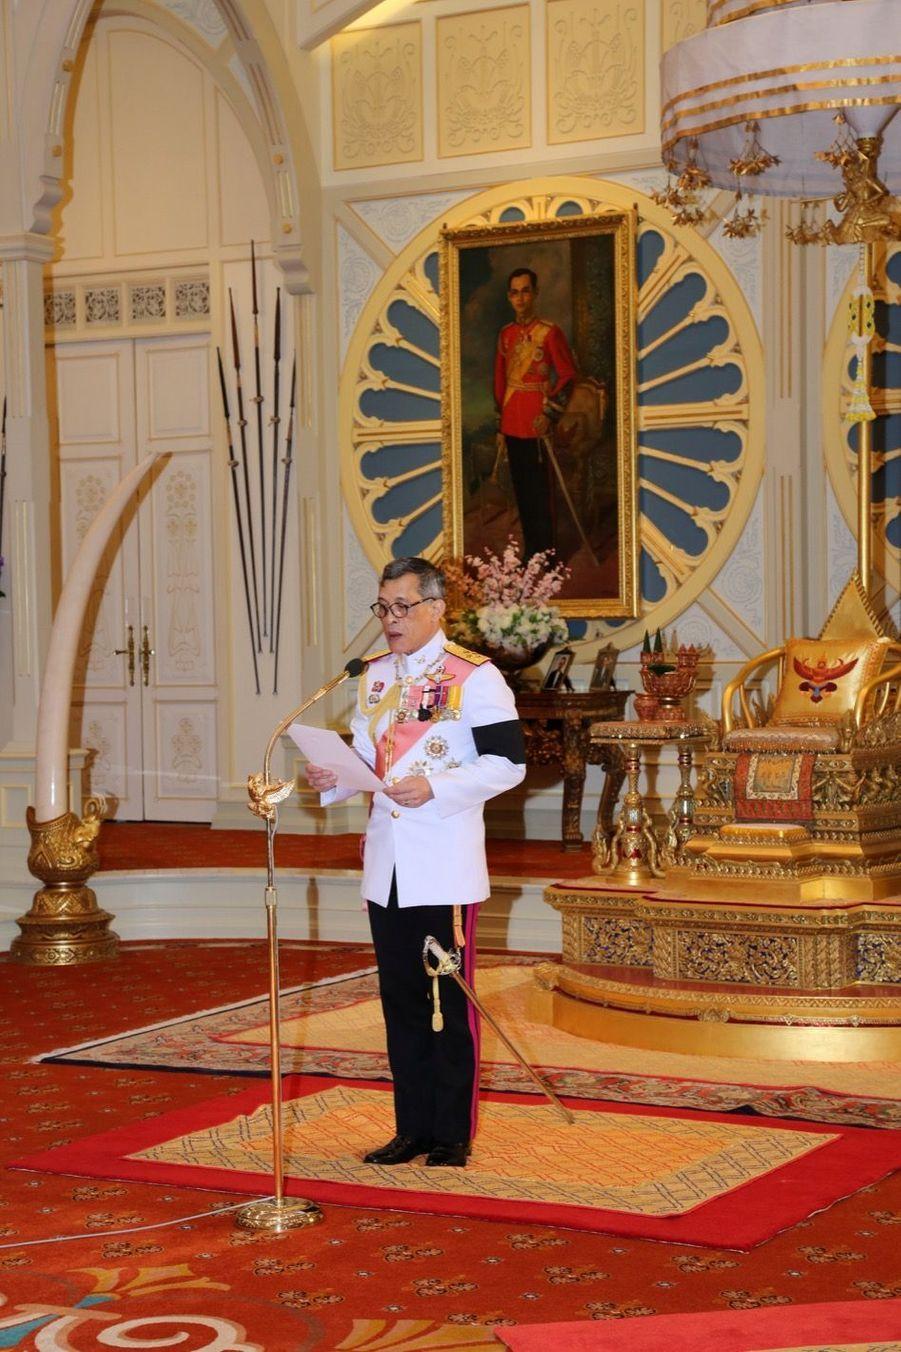 Maha Vajiralongkorn Officiellement Proclamé Roi De Thaïlande 11